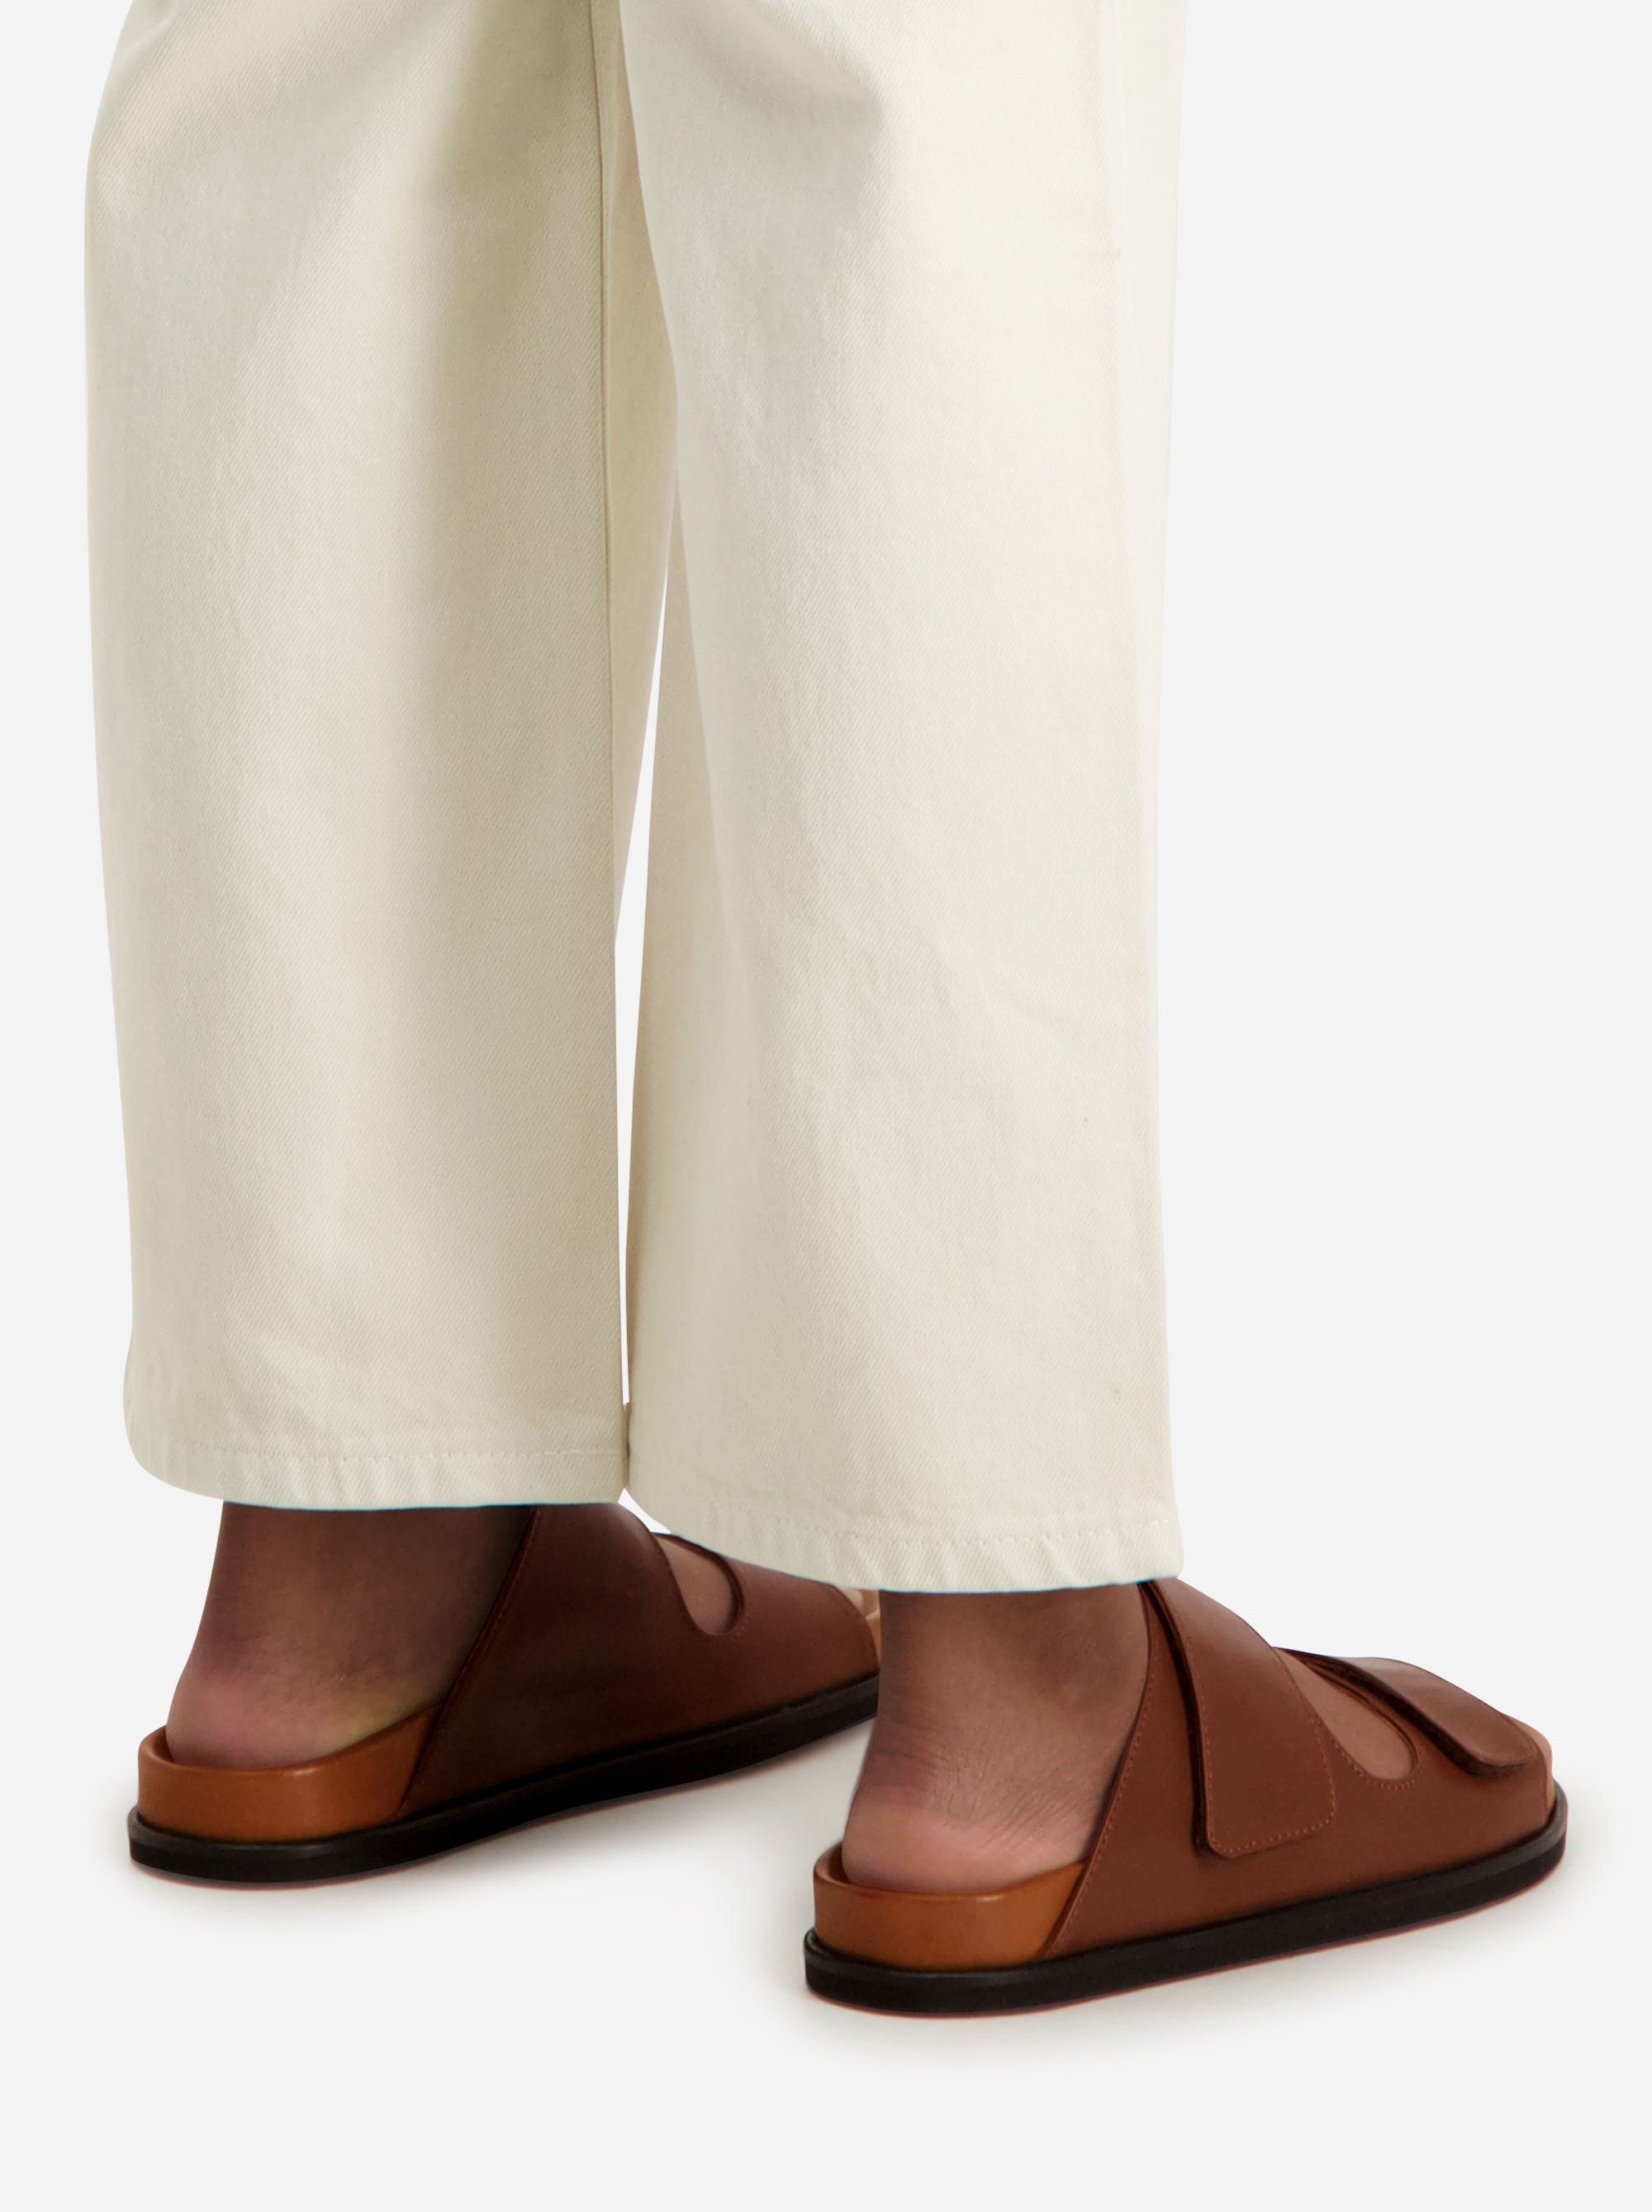 Teym - The Sandal - Women - Brown - 3